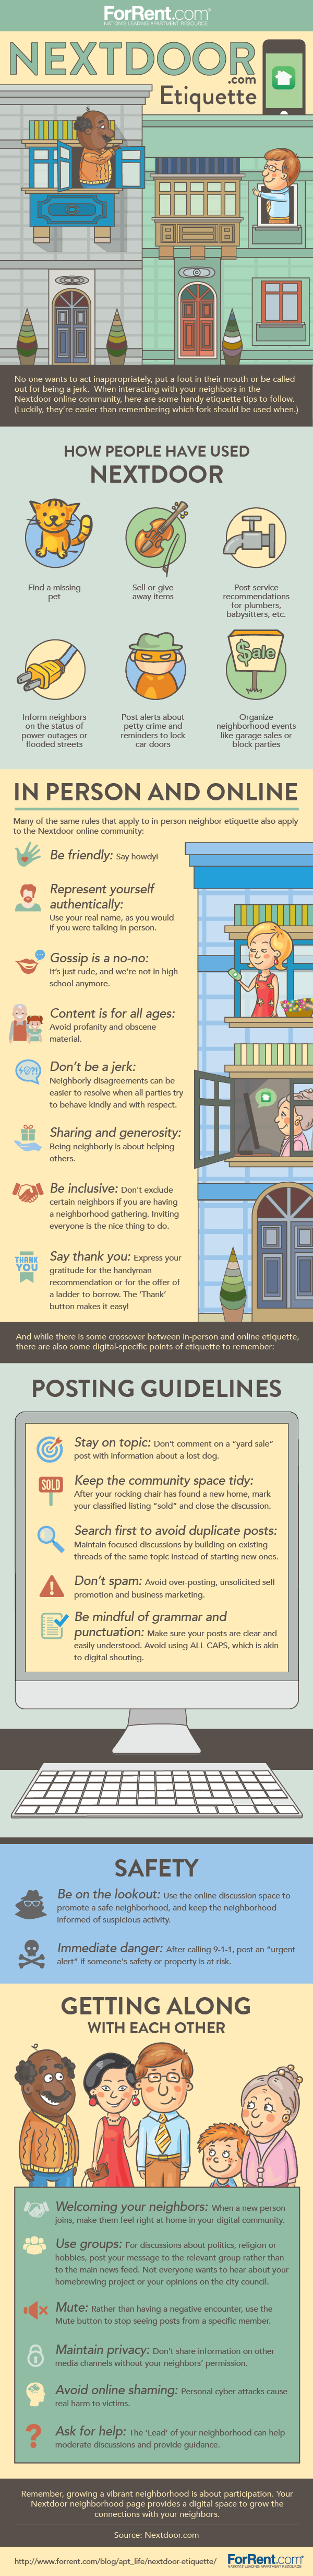 Etiquette Tips for Using NextDoor